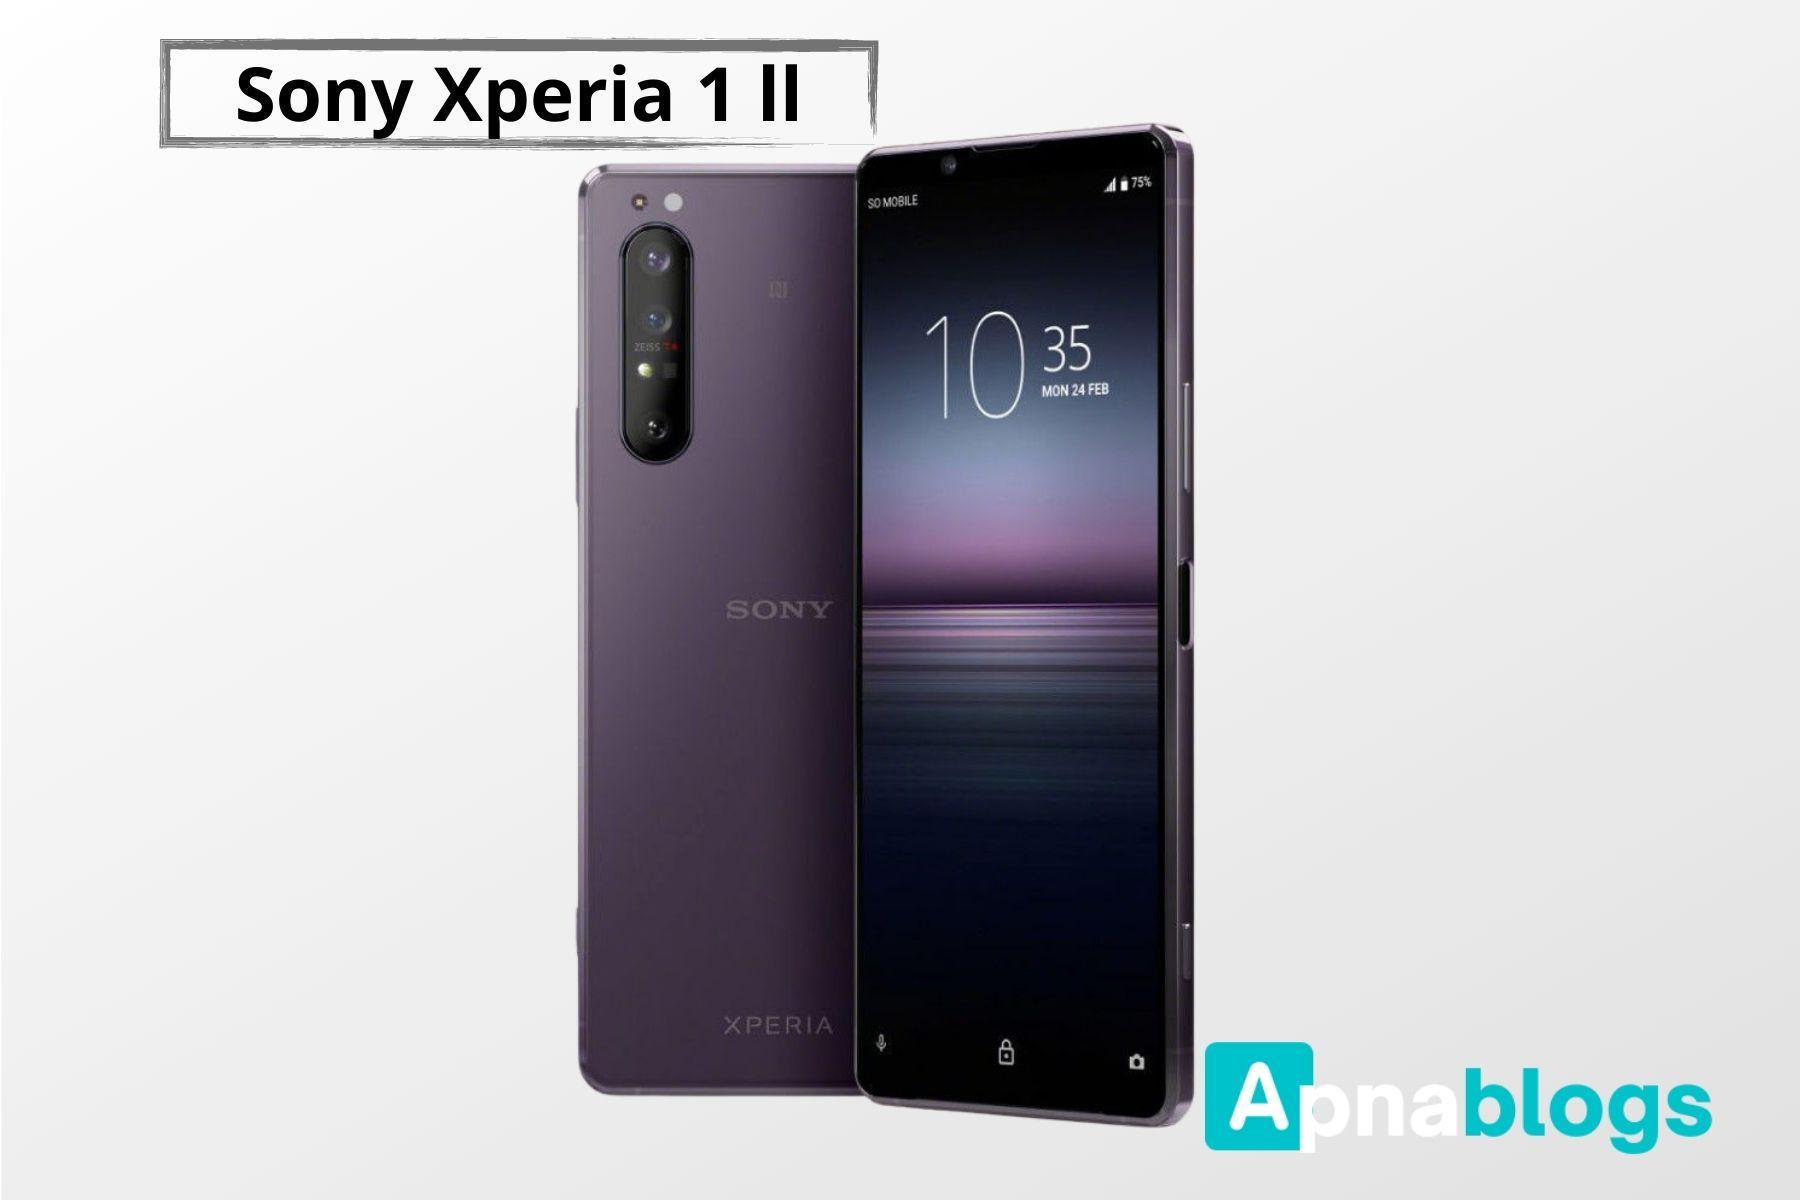 Sony Xperia 1 ll